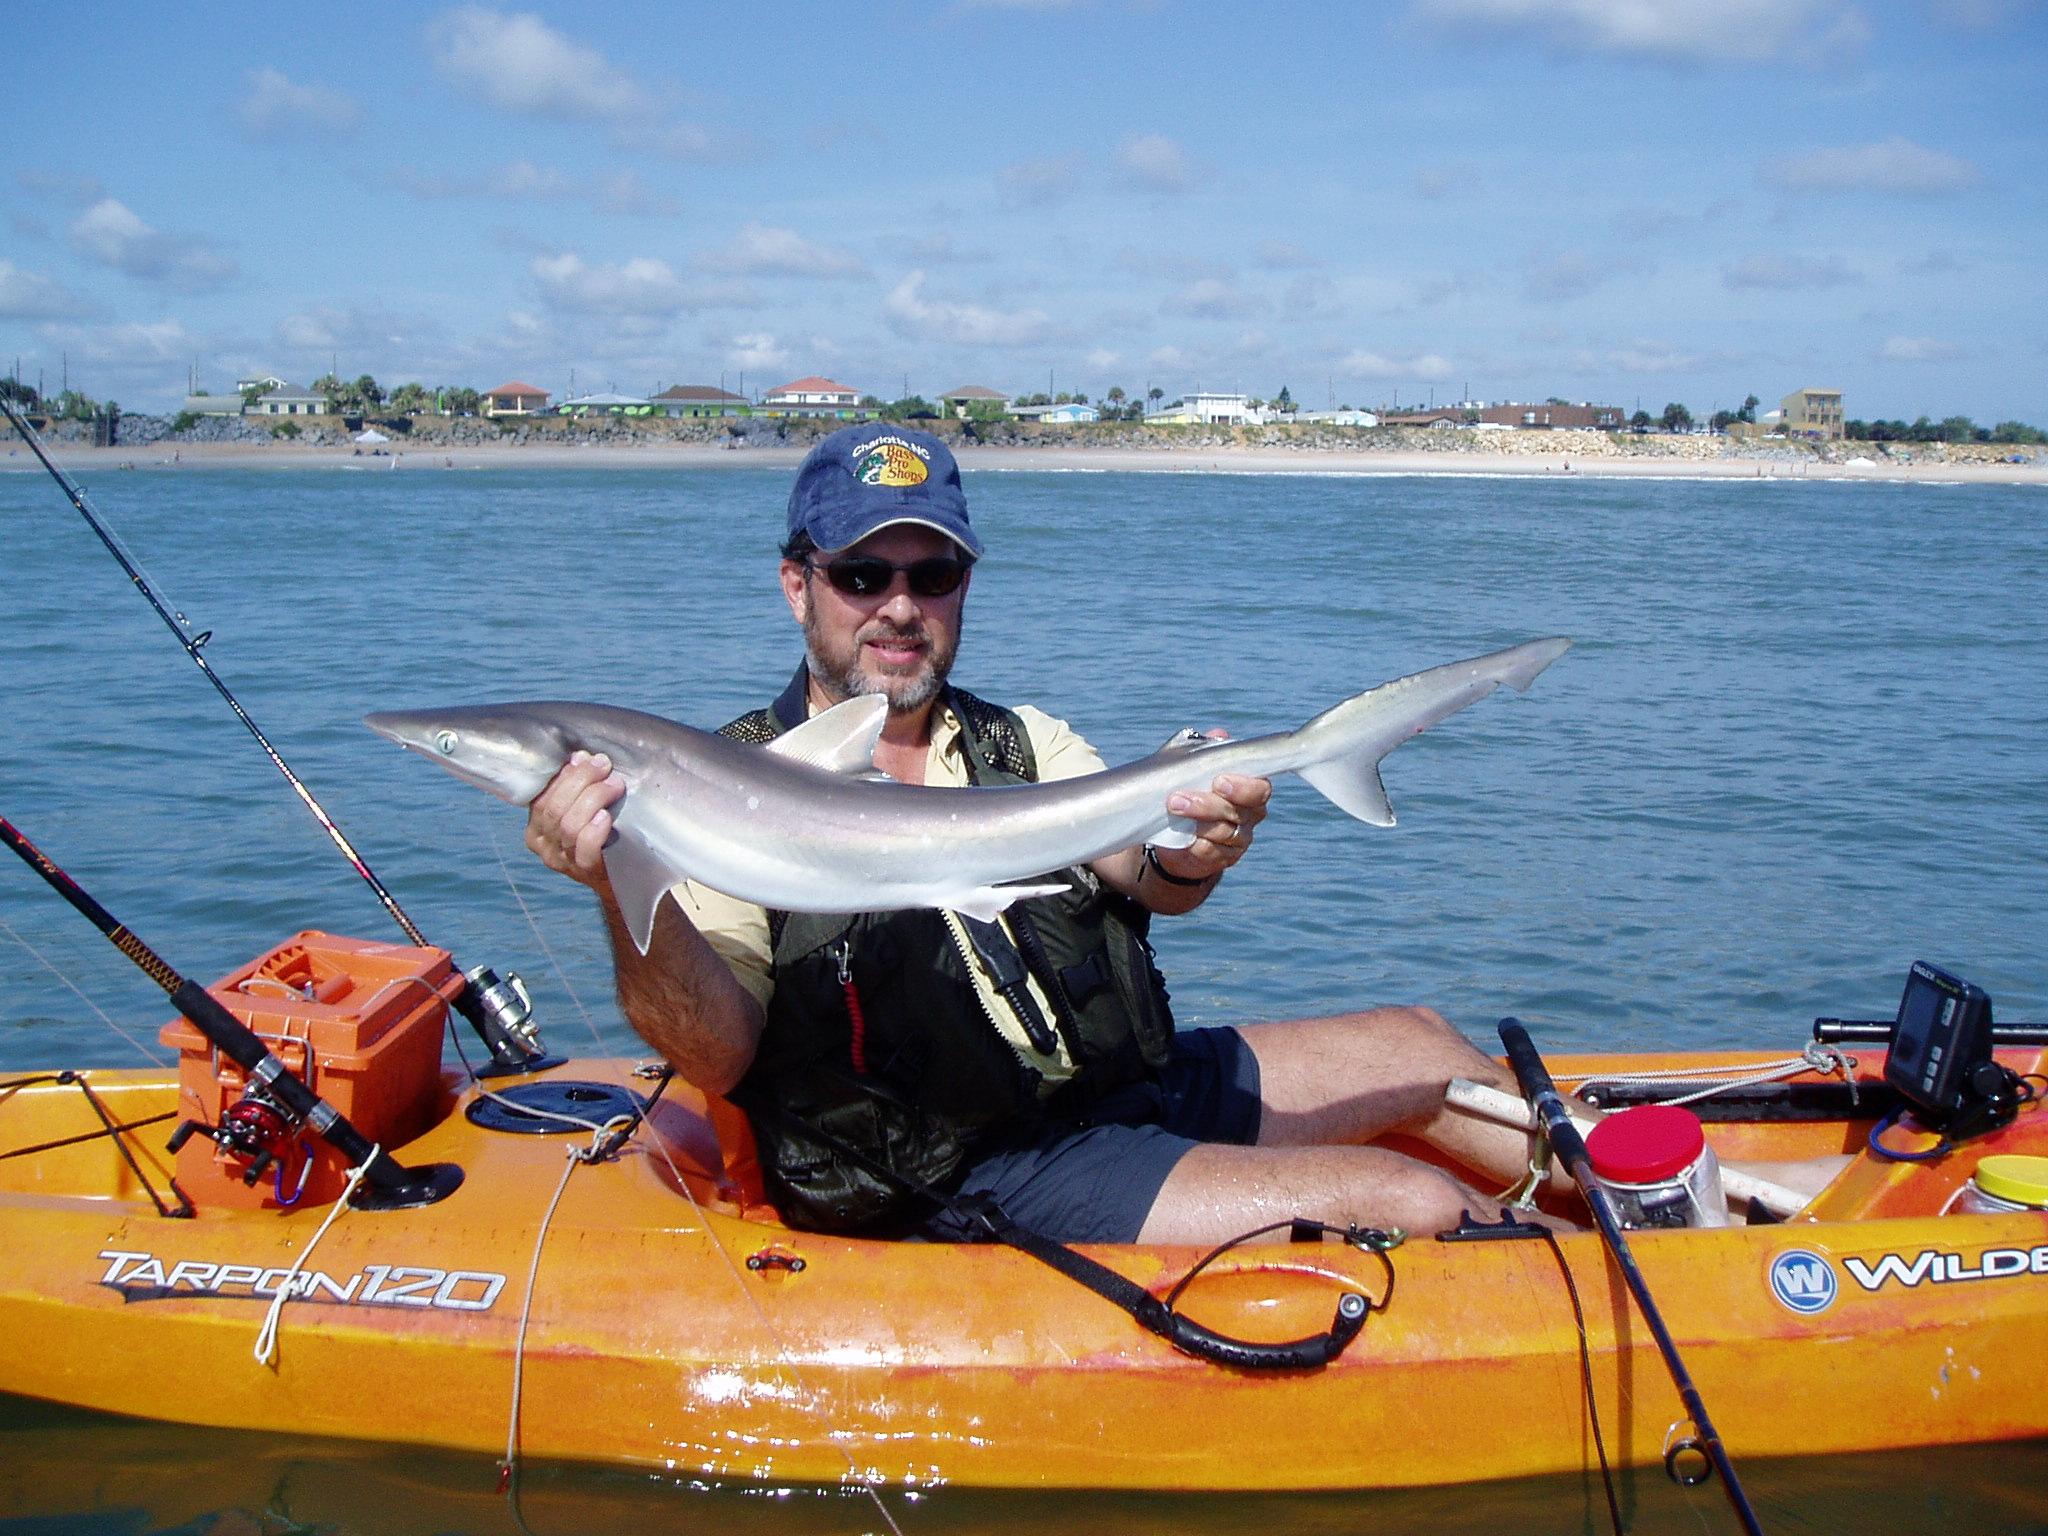 Shark by Kayak